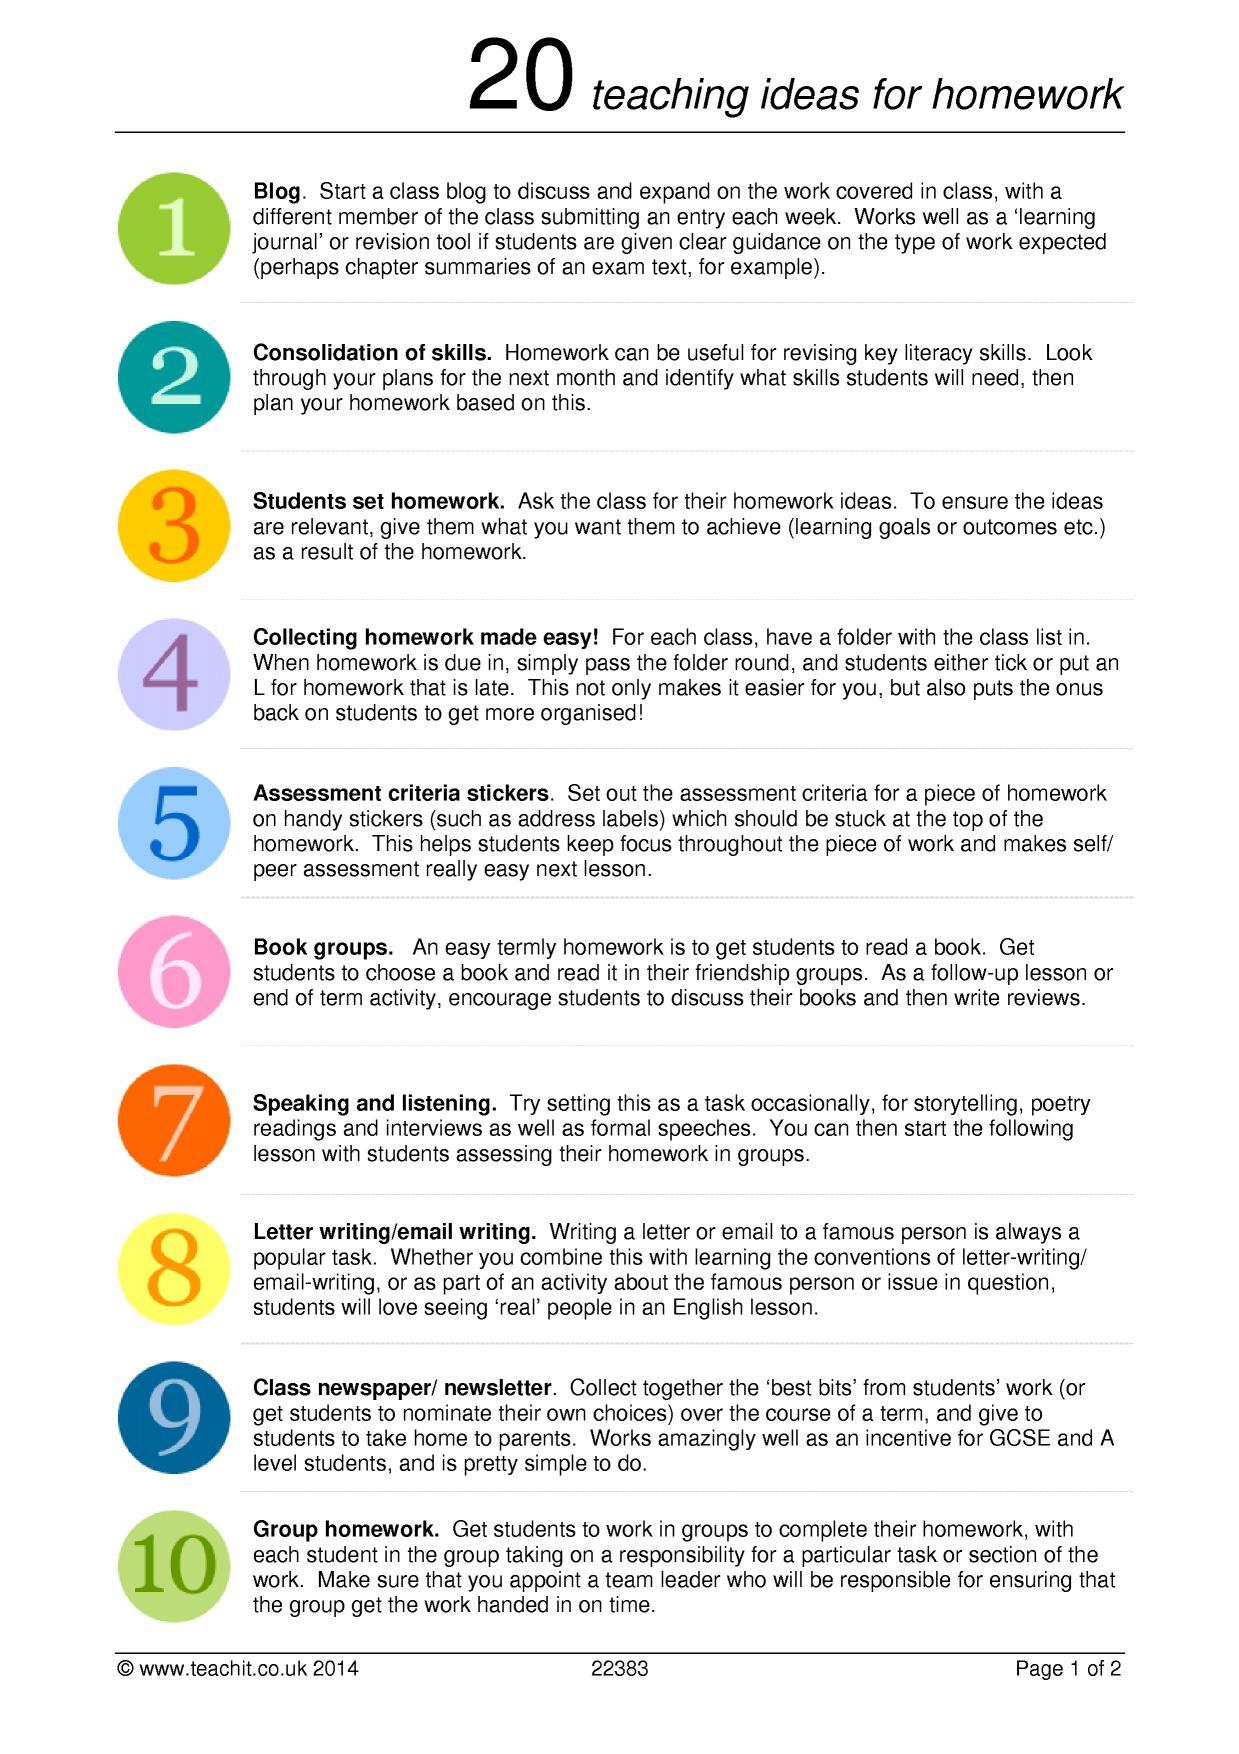 20 Teaching Ideas For Homework